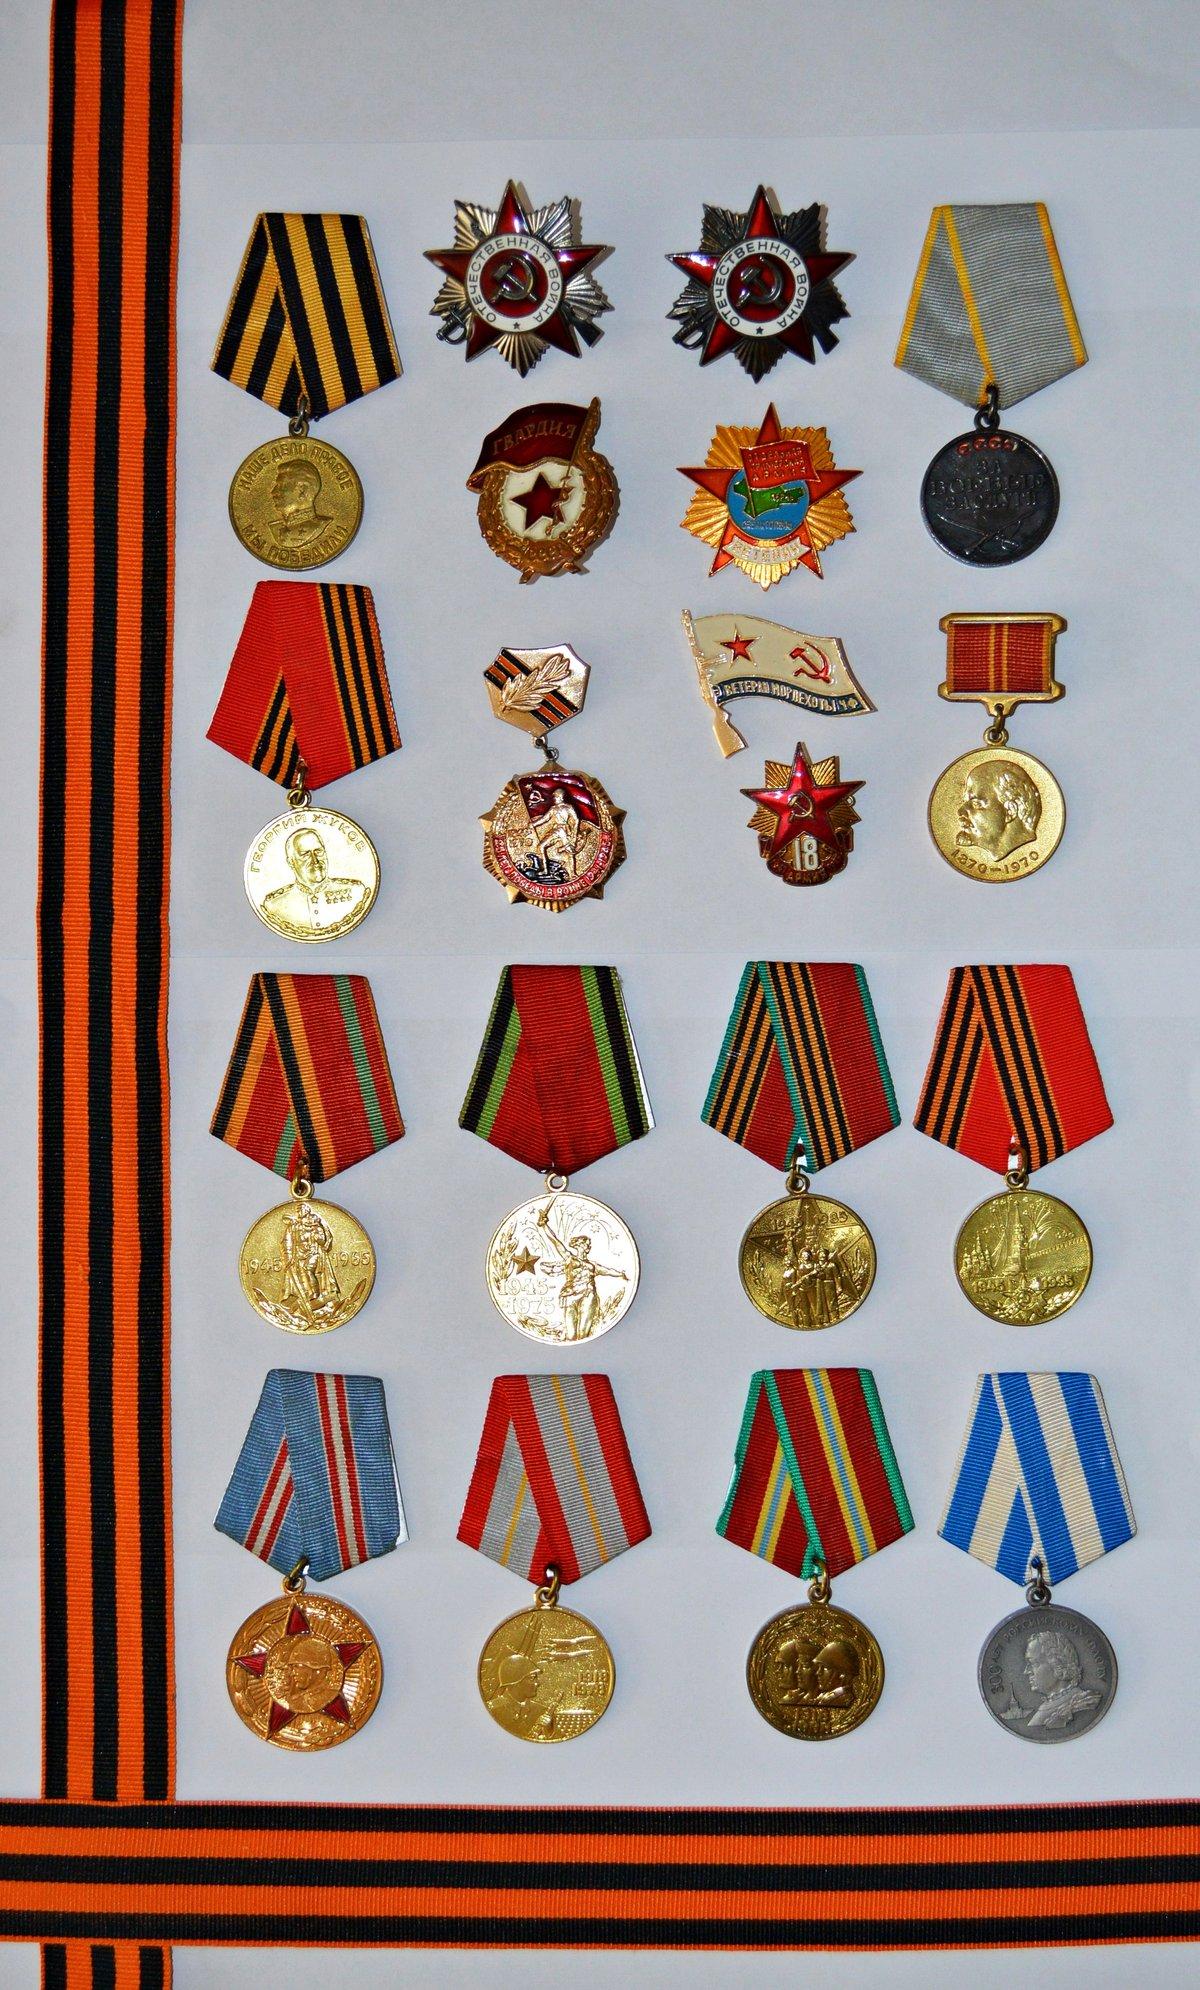 все медали картинки мужским